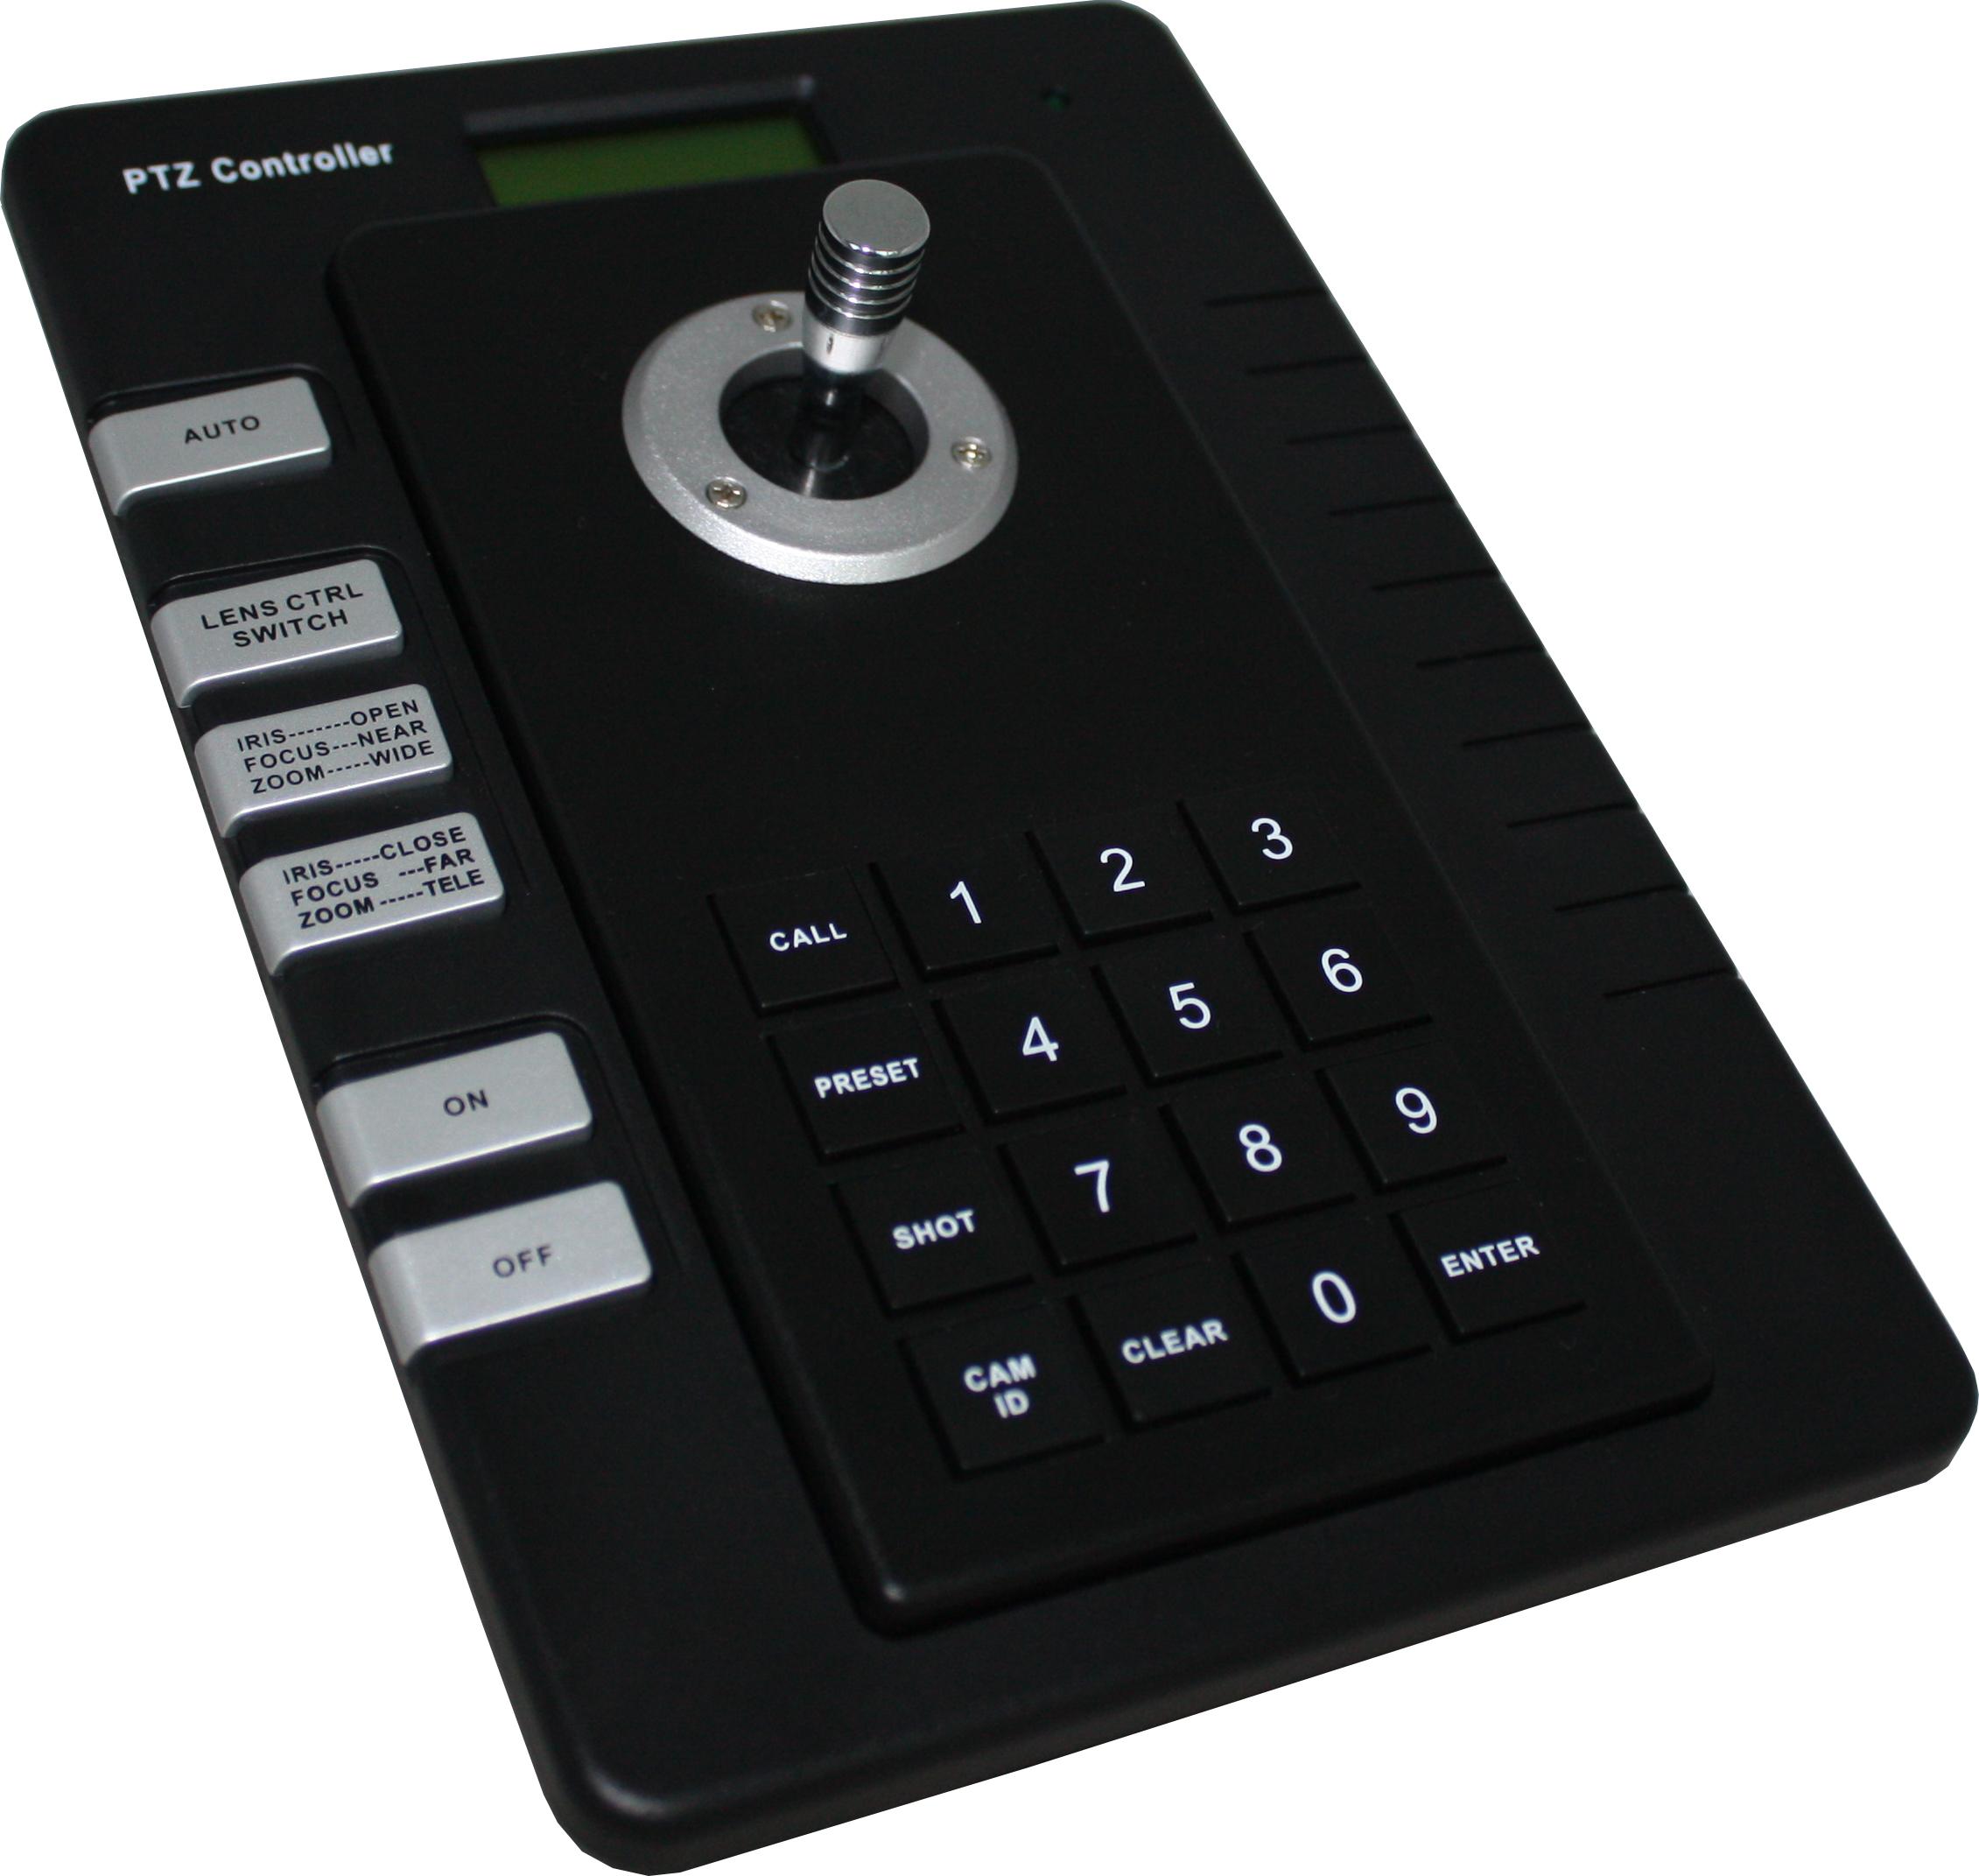 D2 Model Contral Keyboard